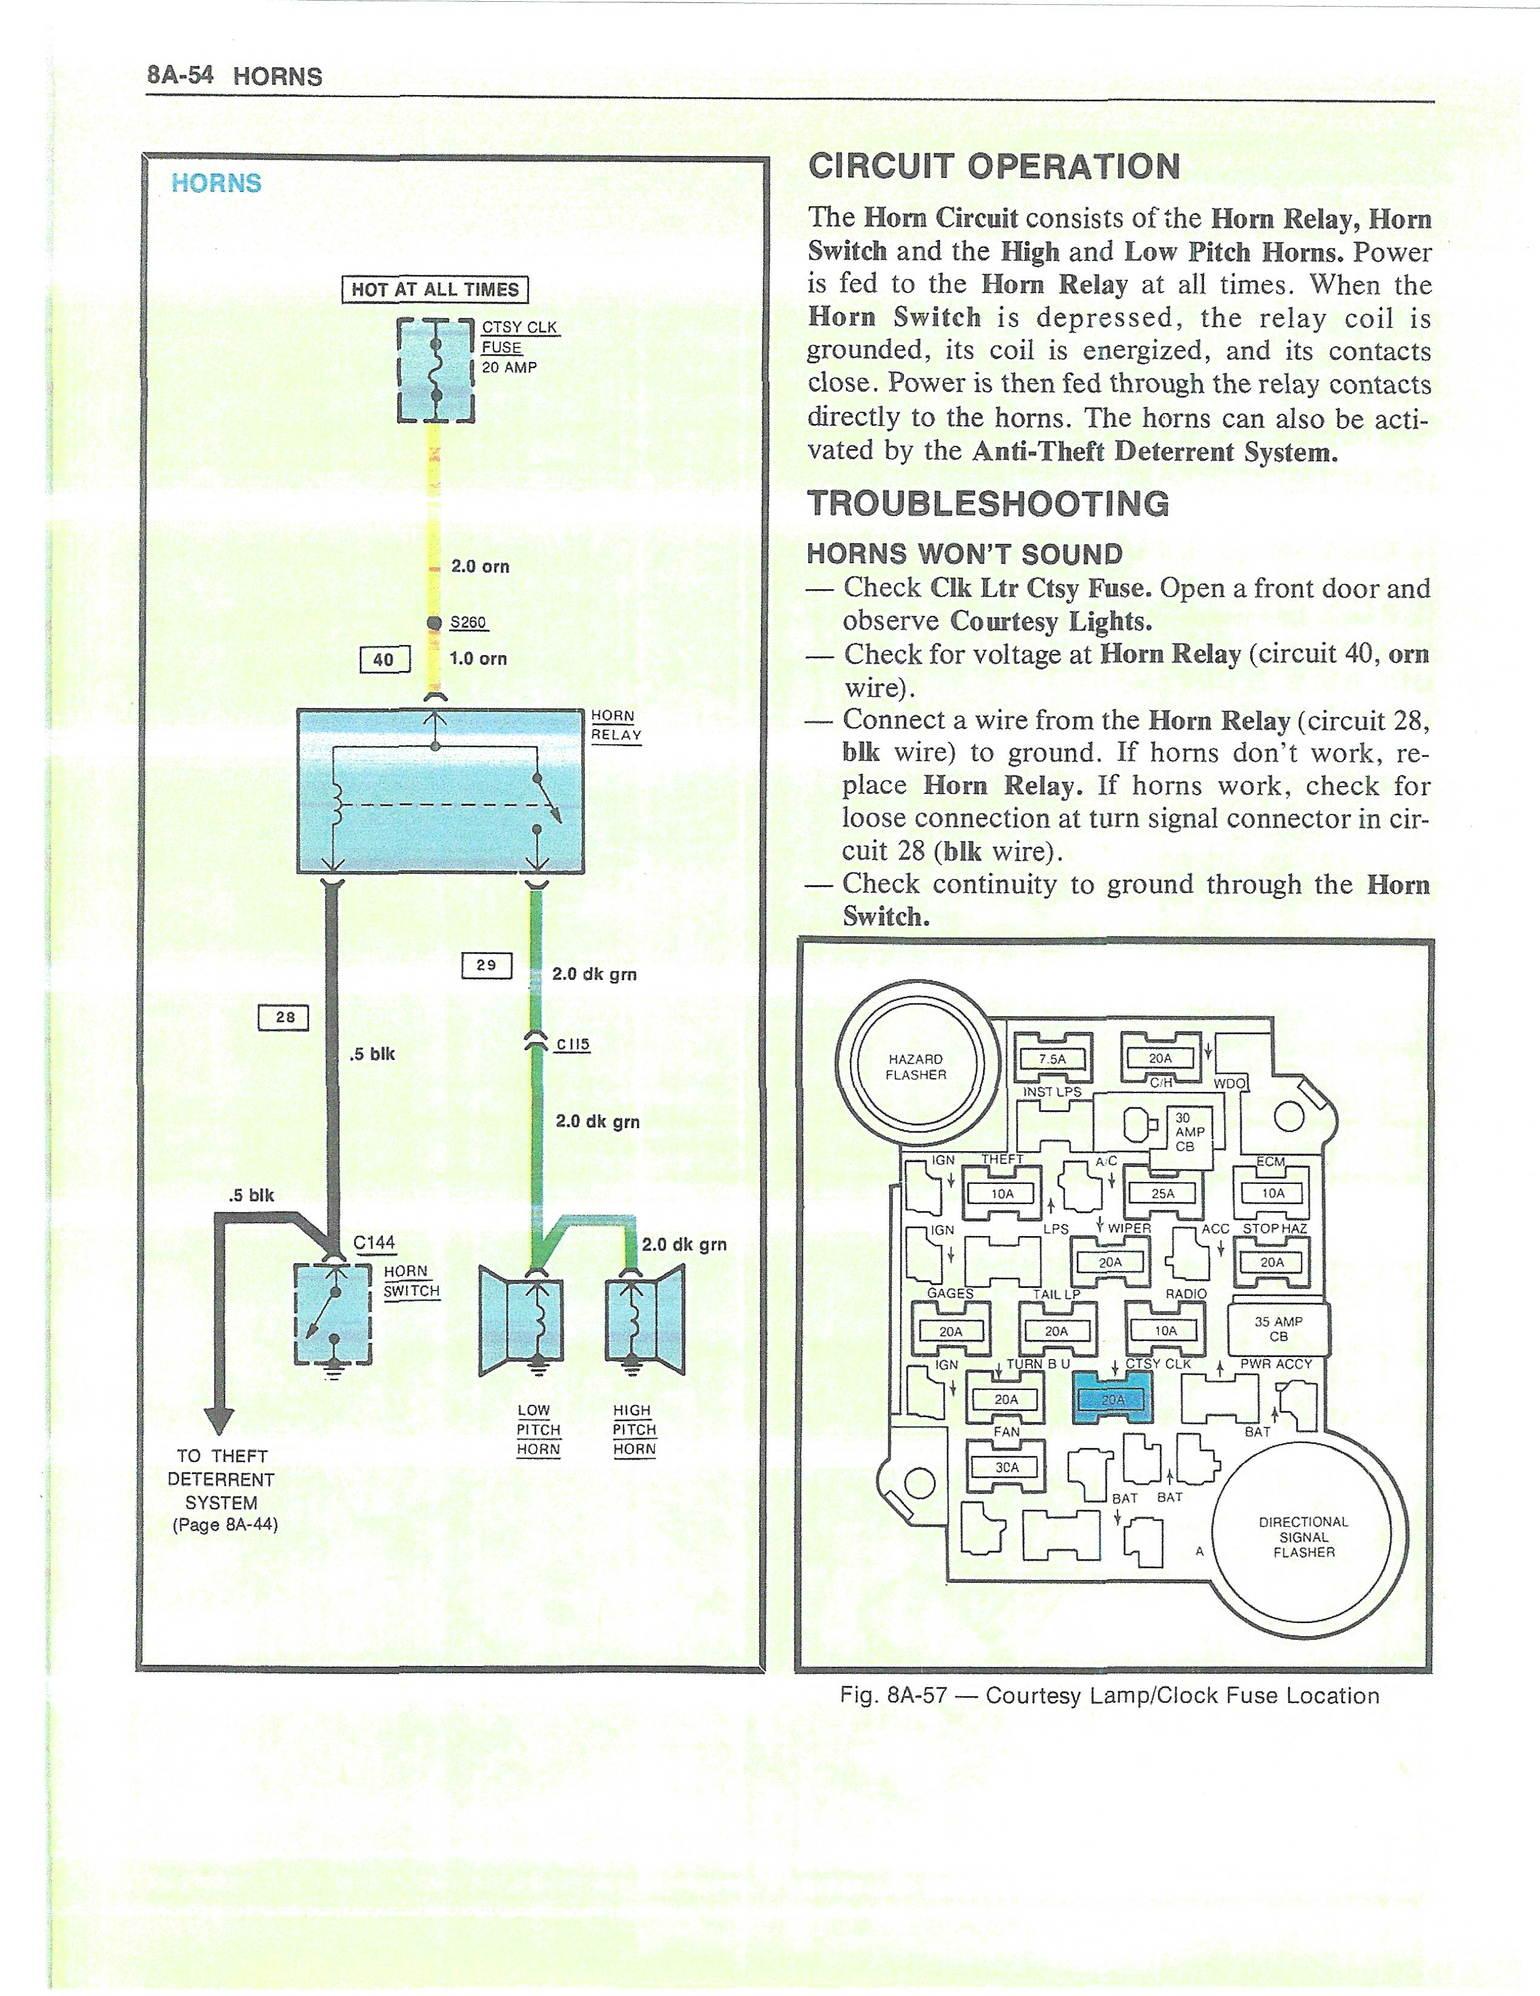 1980 corvette horn wiring diagram - CorvetteForum - Chevrolet Corvette  Forum Discussion | 1981 Corvette Horn Diagram Wiring Schematic |  | Corvette Forum